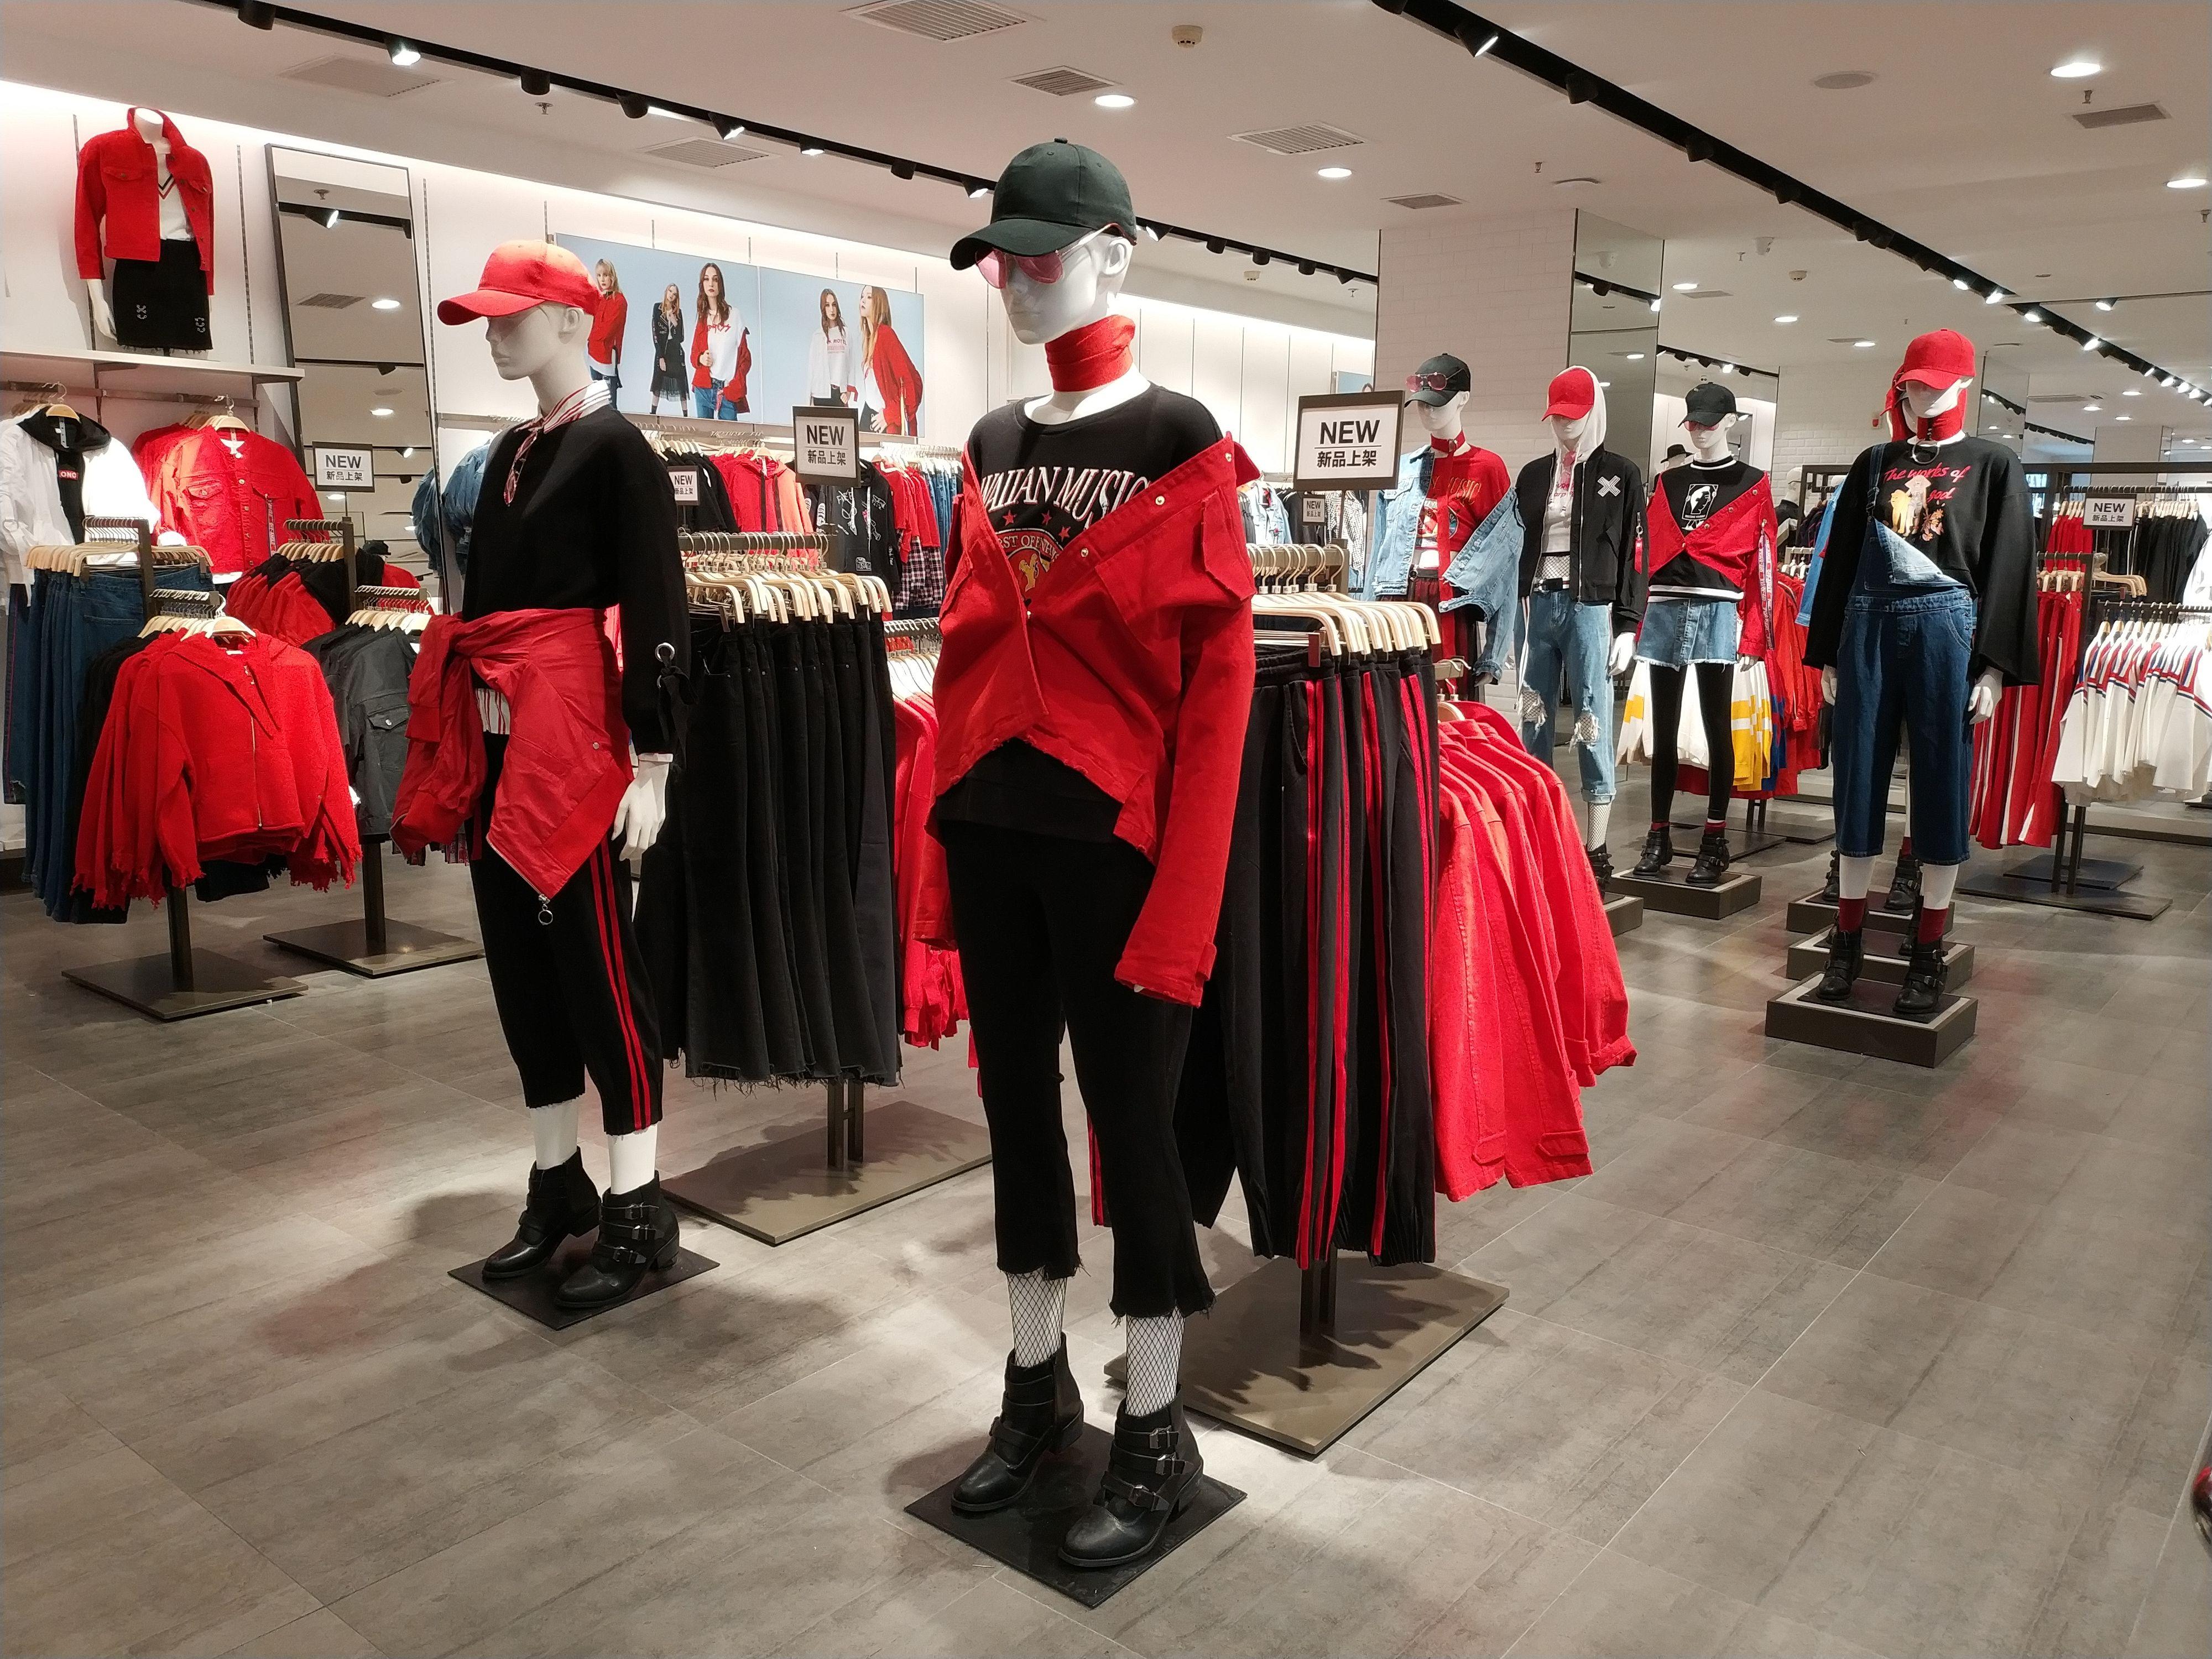 Yishion 2018 Spring Collection Ladies Instore Display Interior De Loja De Roupas Design De Loja Vitrine De Moda